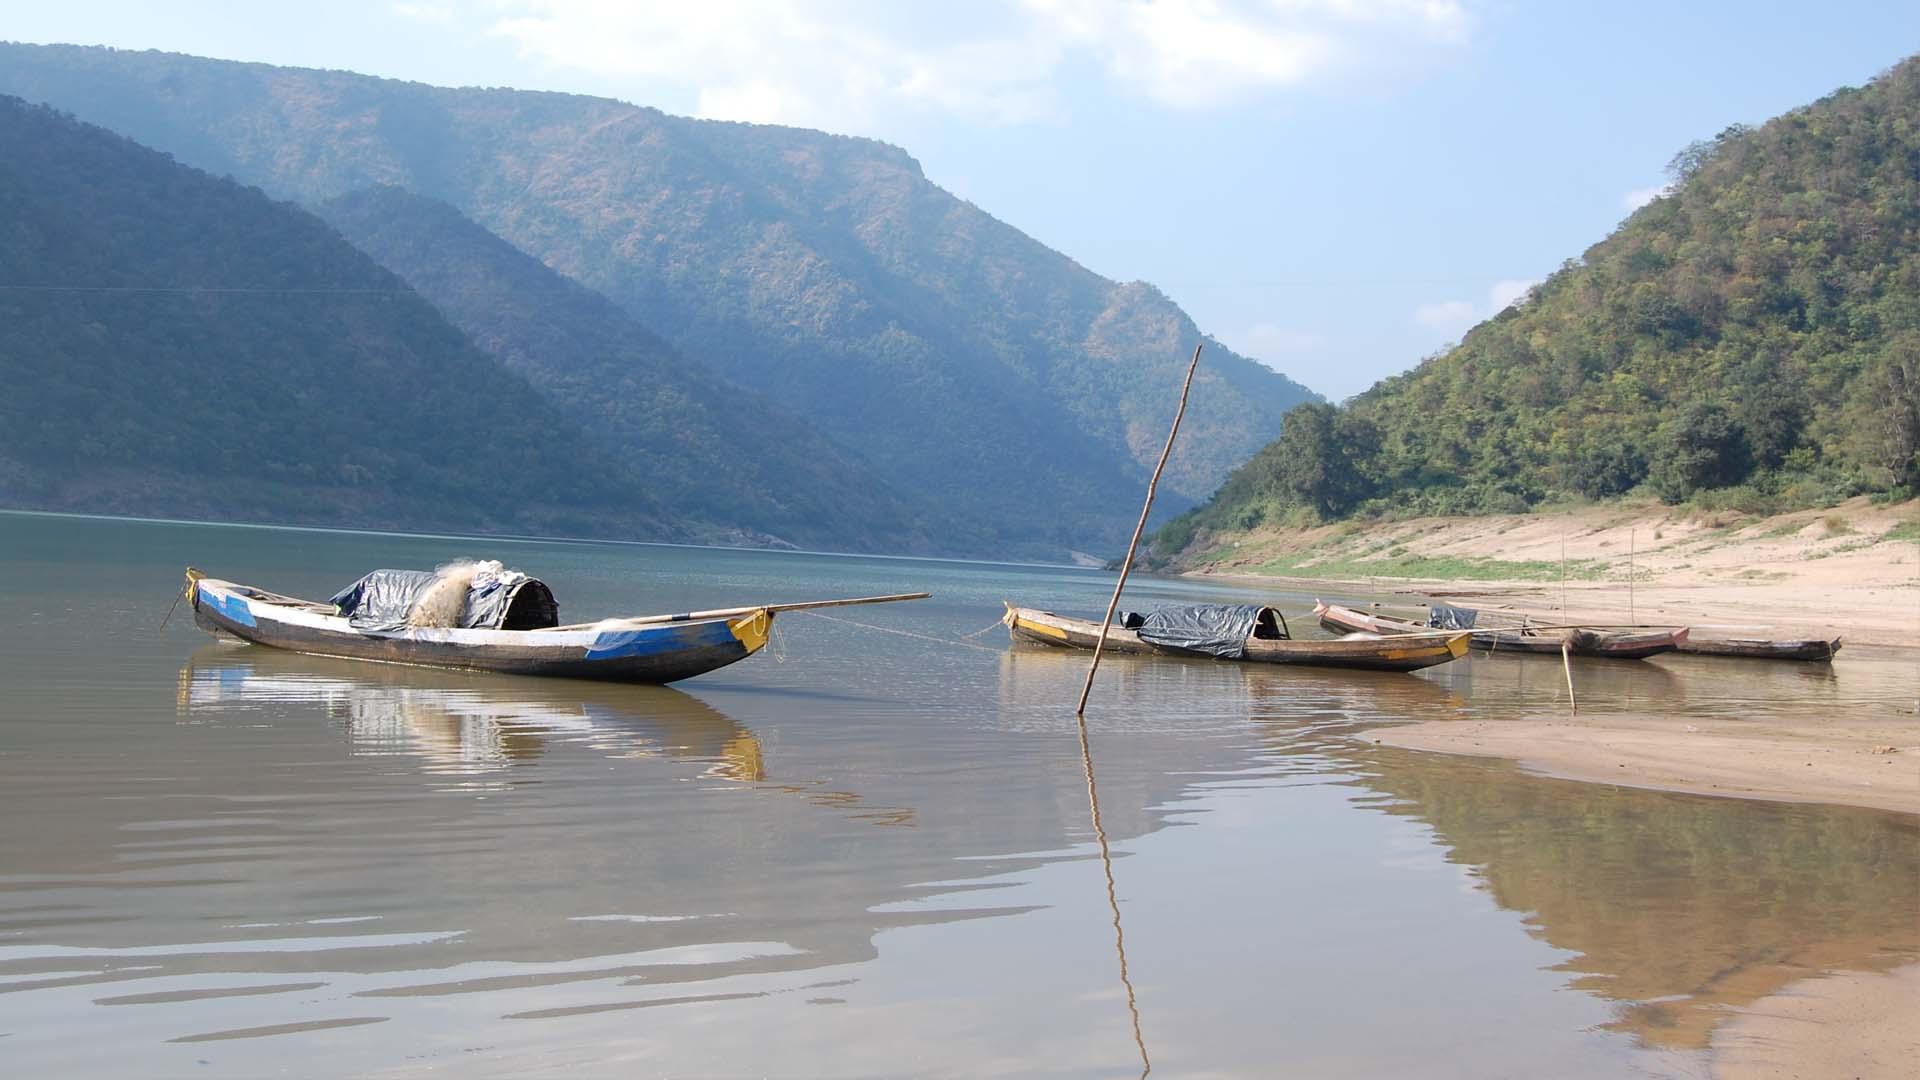 Maruthi Tourism Papikondalu